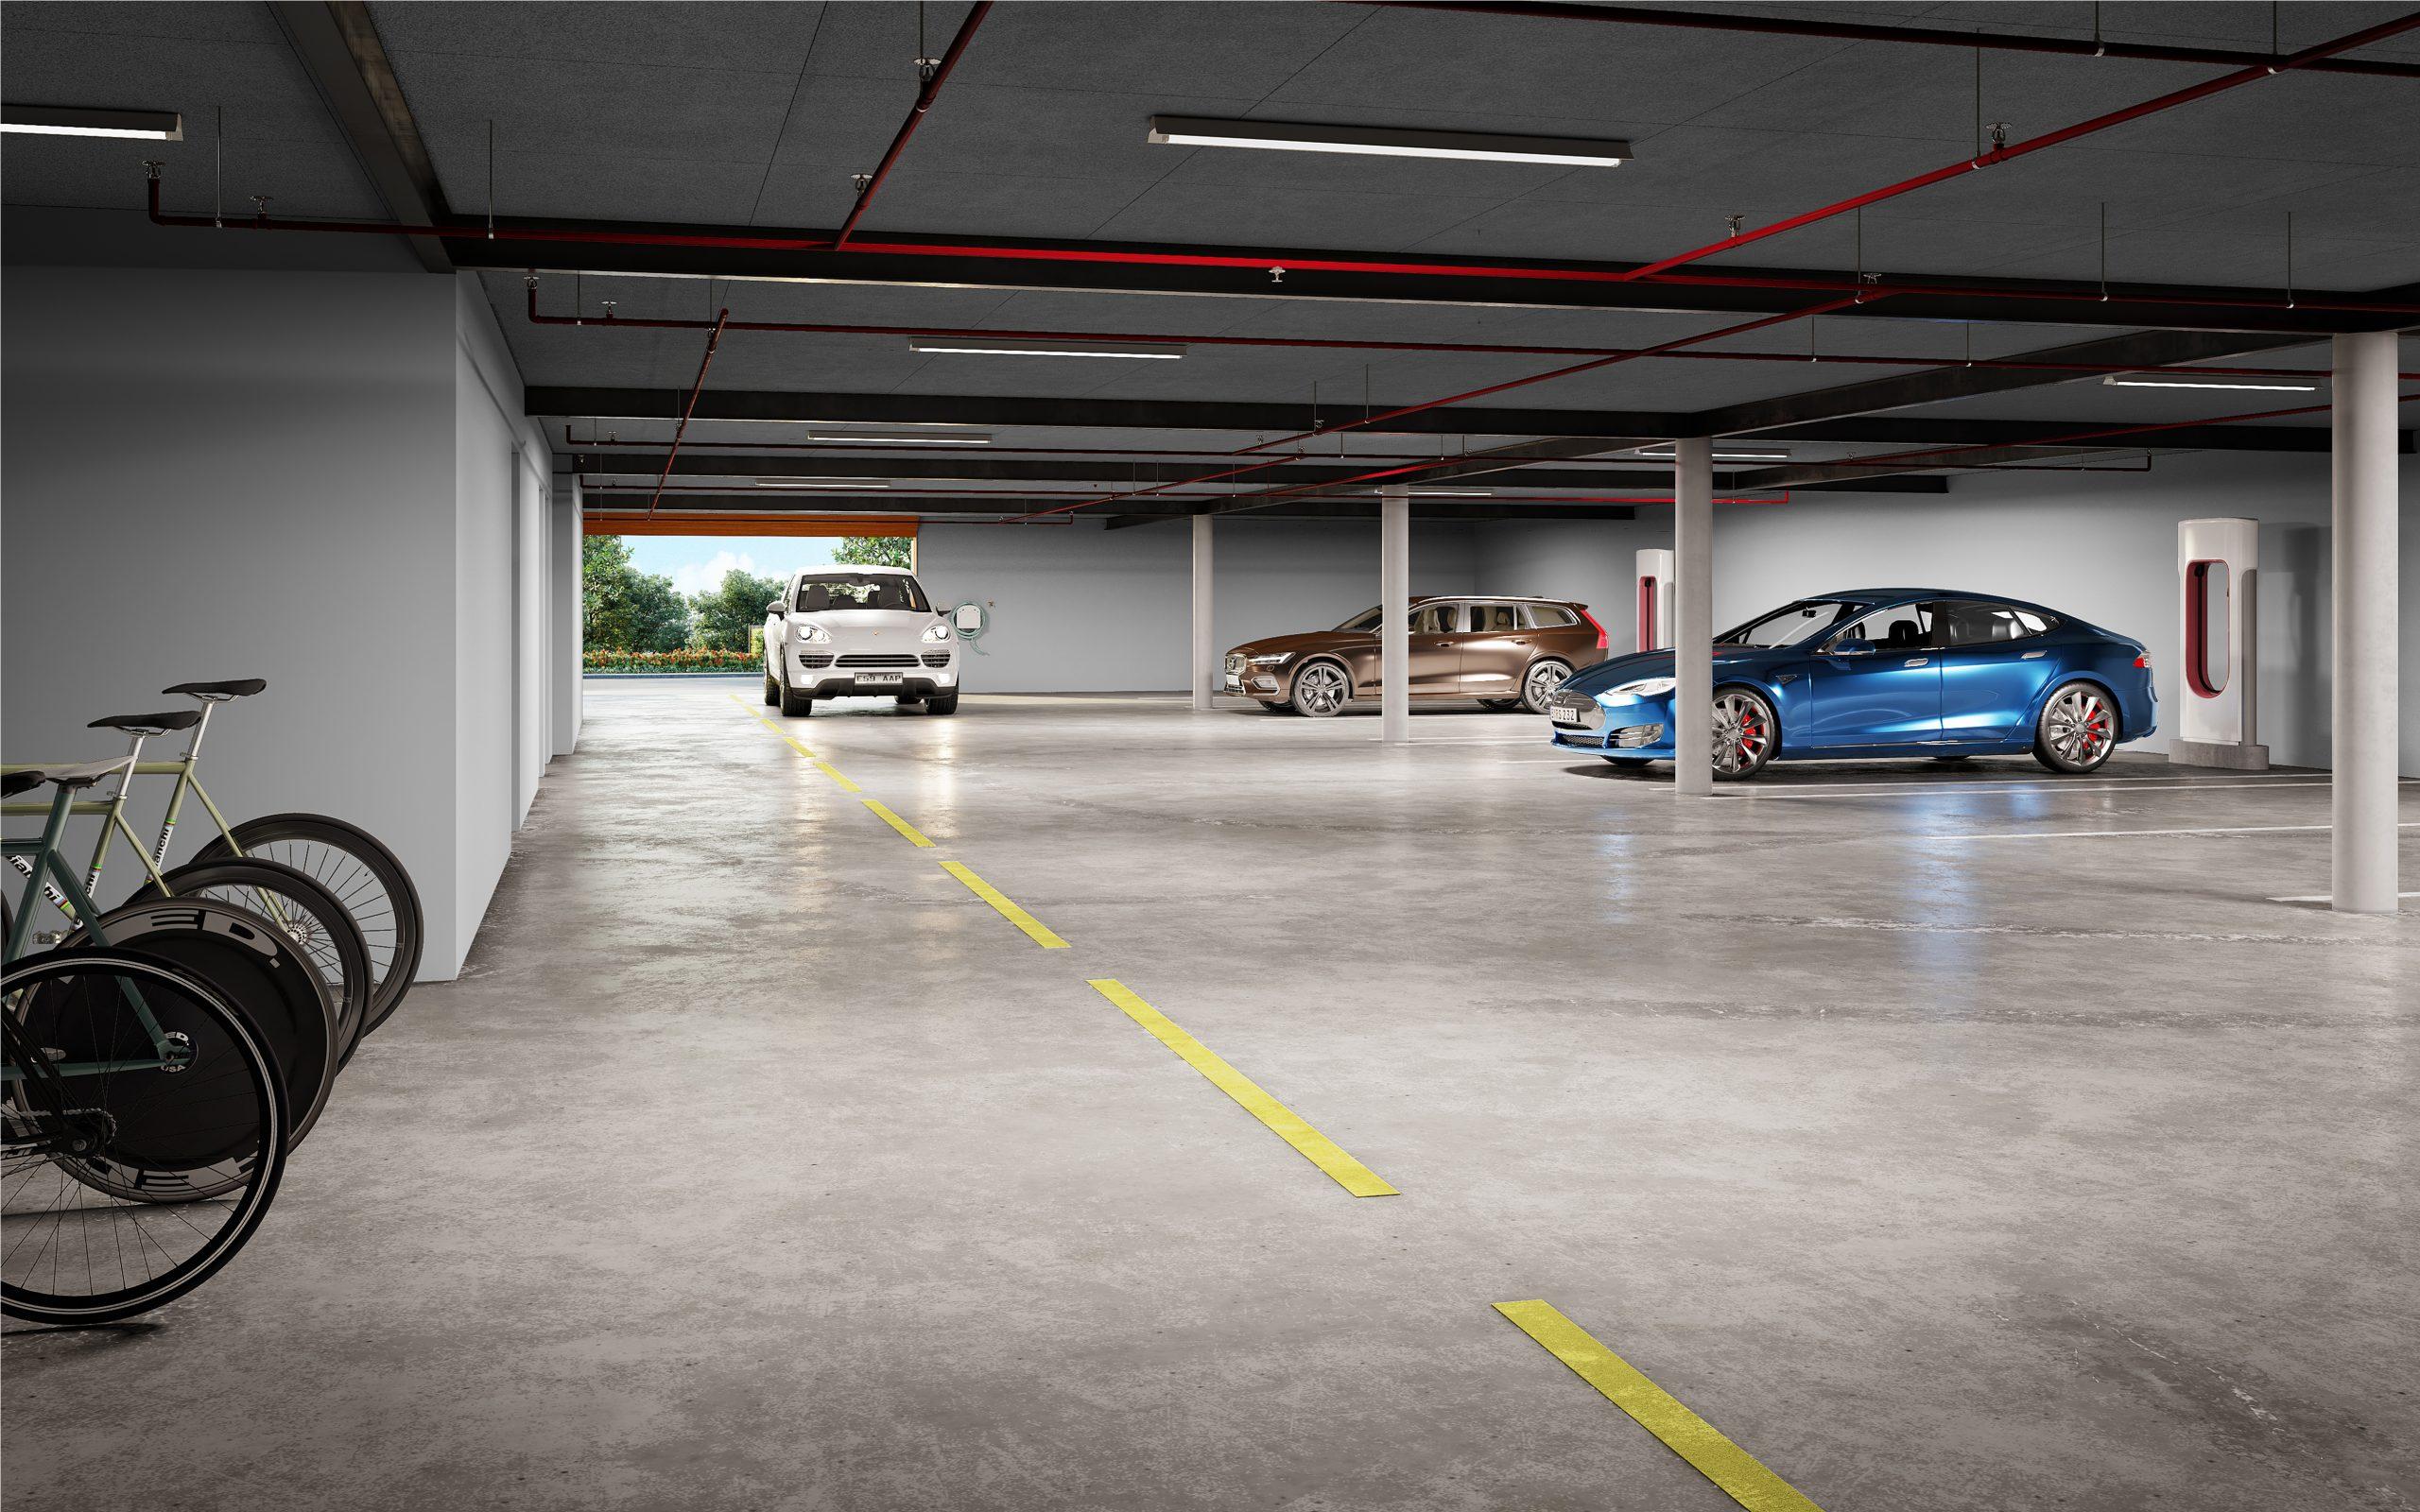 Garage underground electric vehicle charging